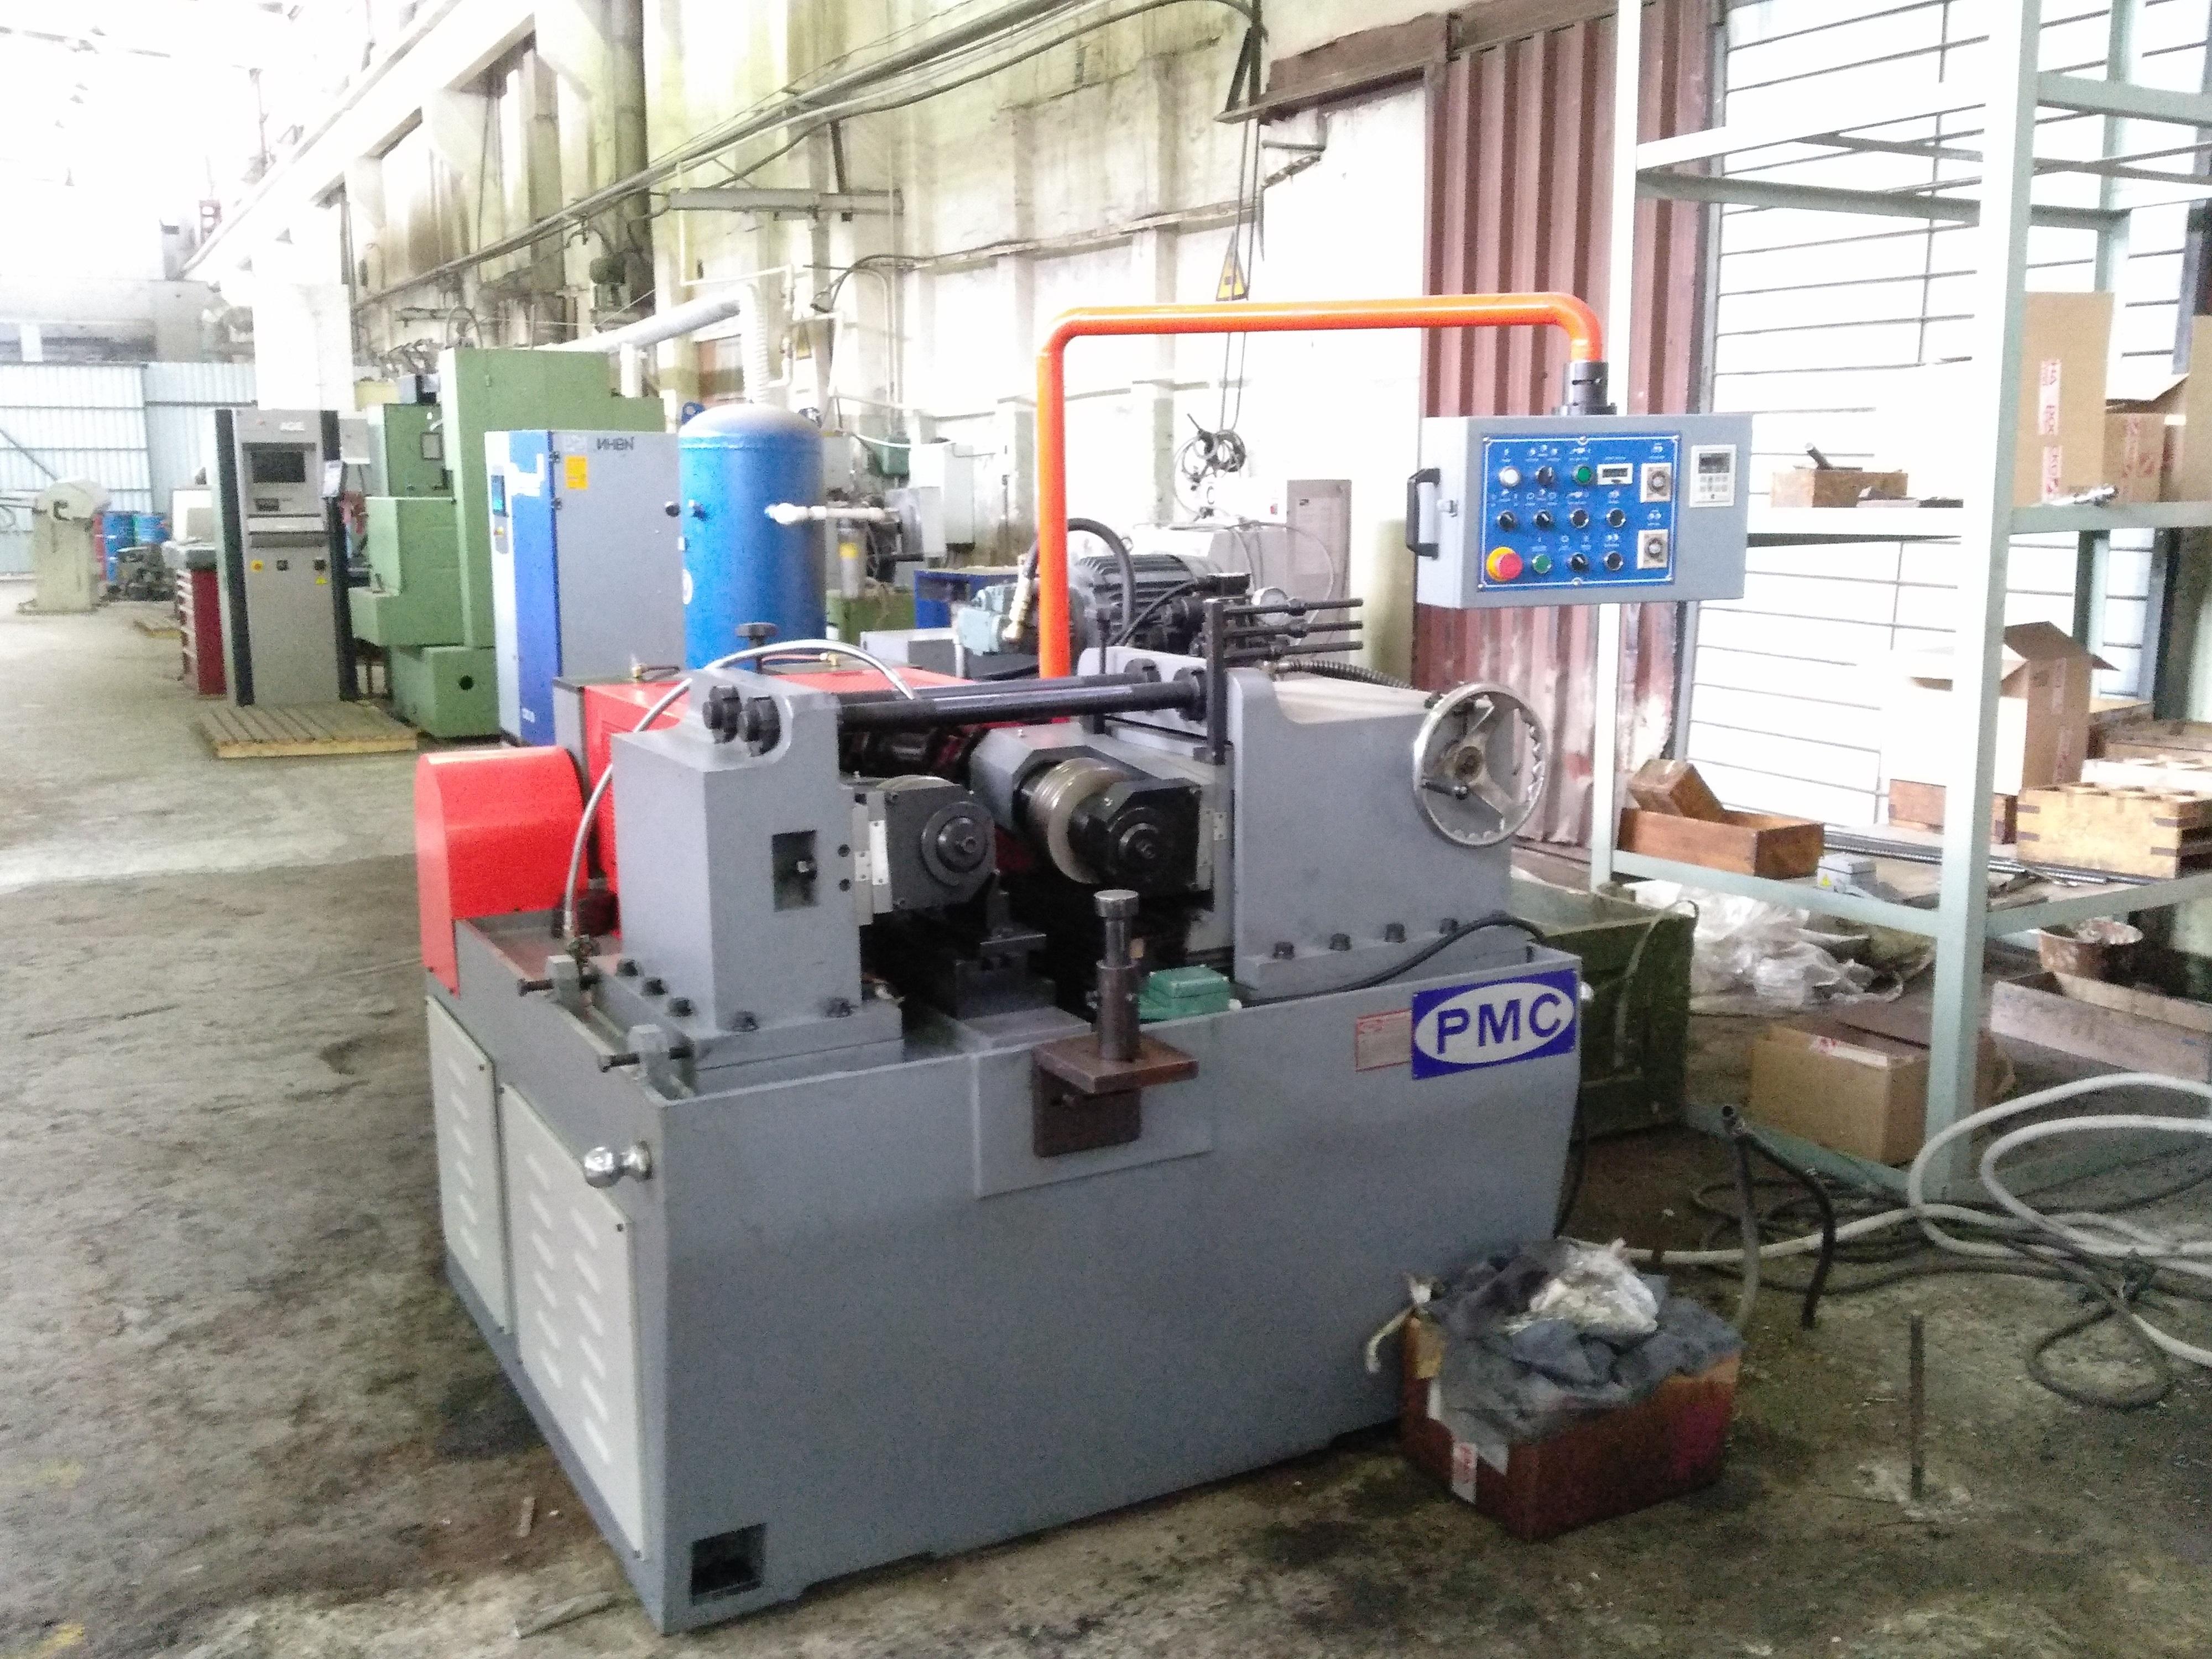 PMC PM-60VS Thread rolling machine - Exapro